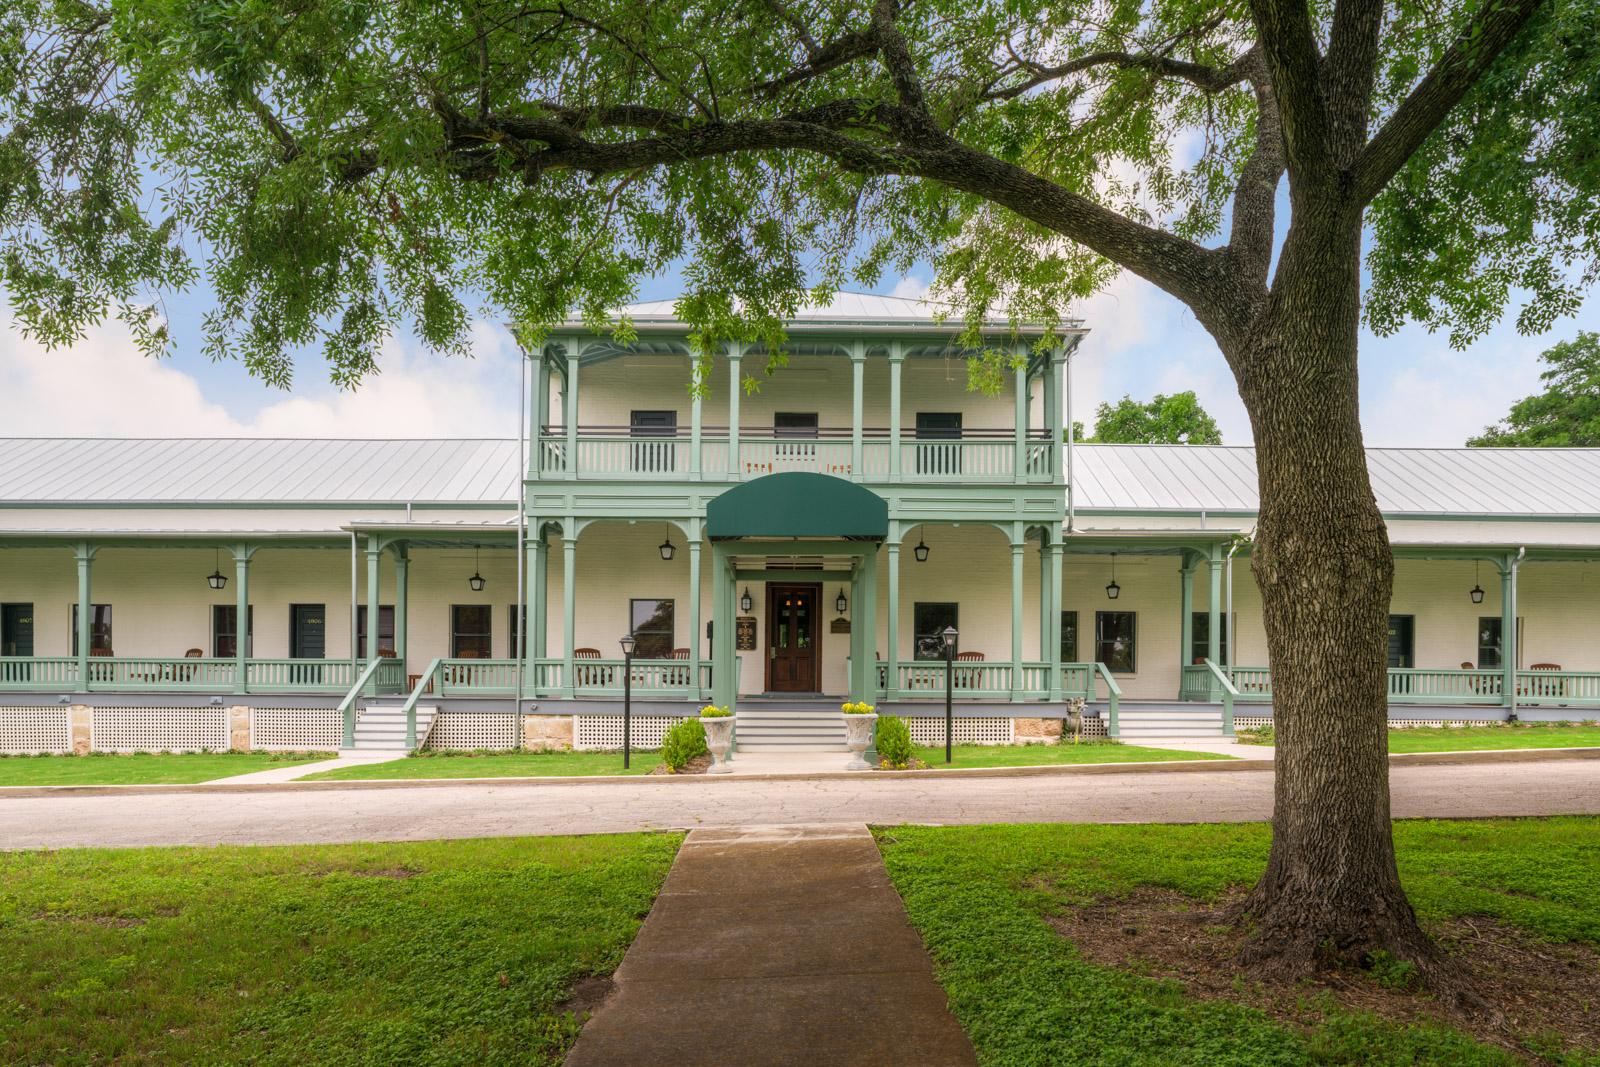 20190510-Sam Houston House-Web Size-7.jpg